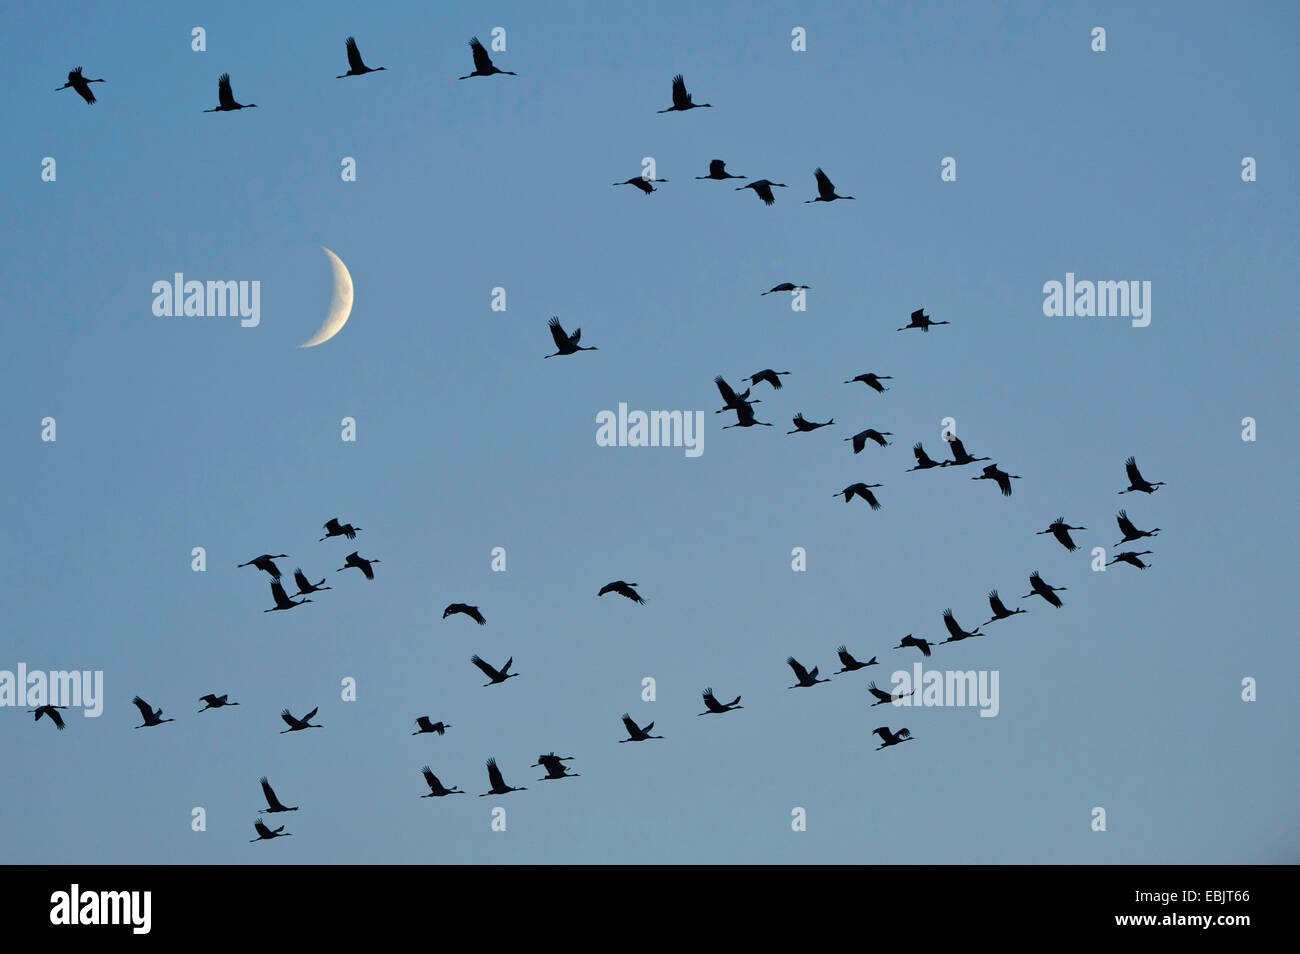 Common crane, Eurasian Crane (Grus grus), bird migration in front of the moon, Germany, Lower Saxony Stock Photo